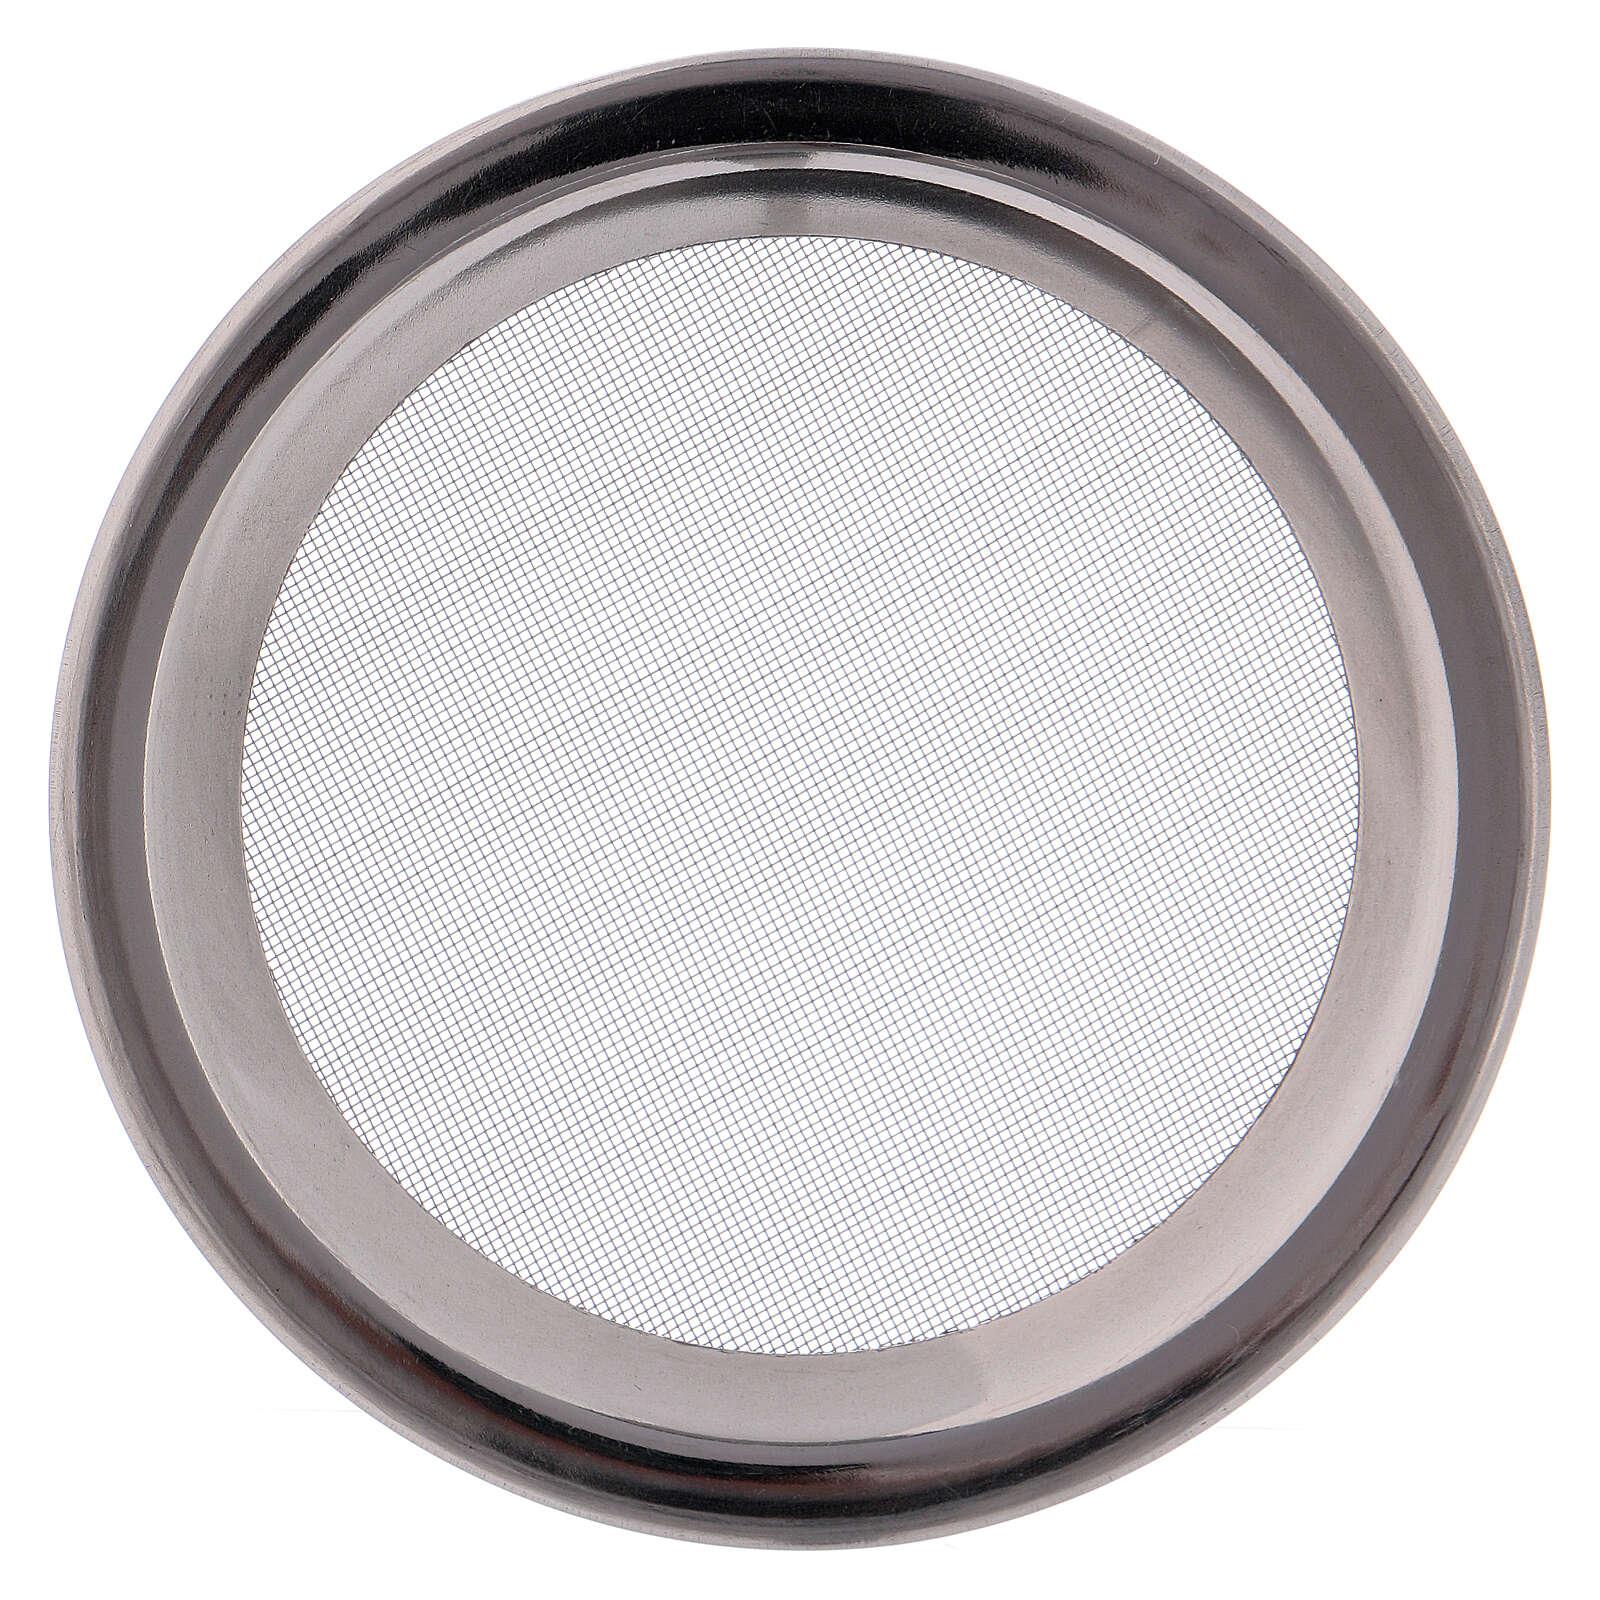 Spare net for incense burner silver-colored polish steel diam. 3 3/4 in 3